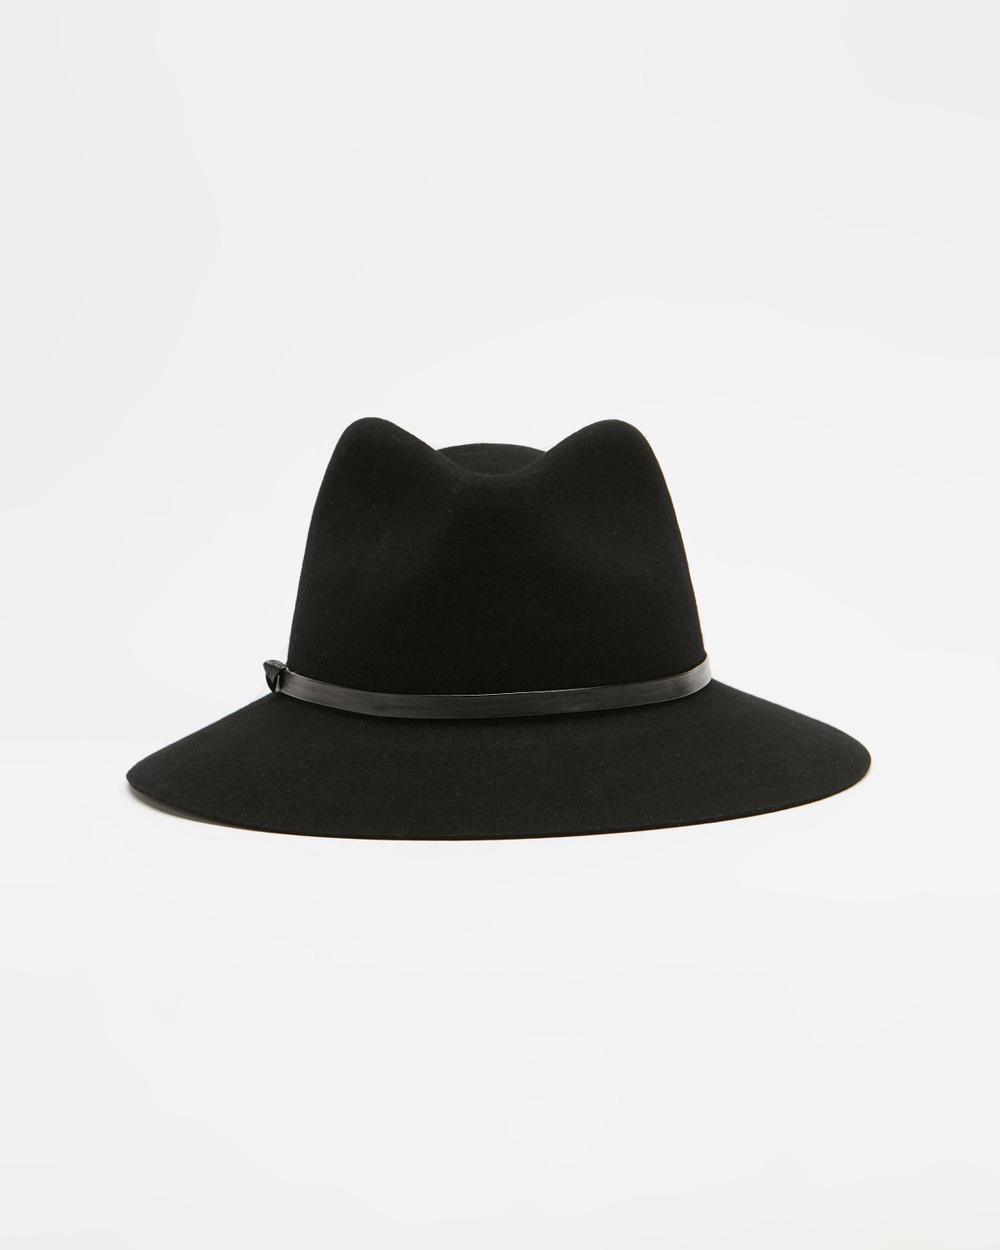 Ace Of Something ICONIC EXCLUSIVE Durango Fedora Hats Black